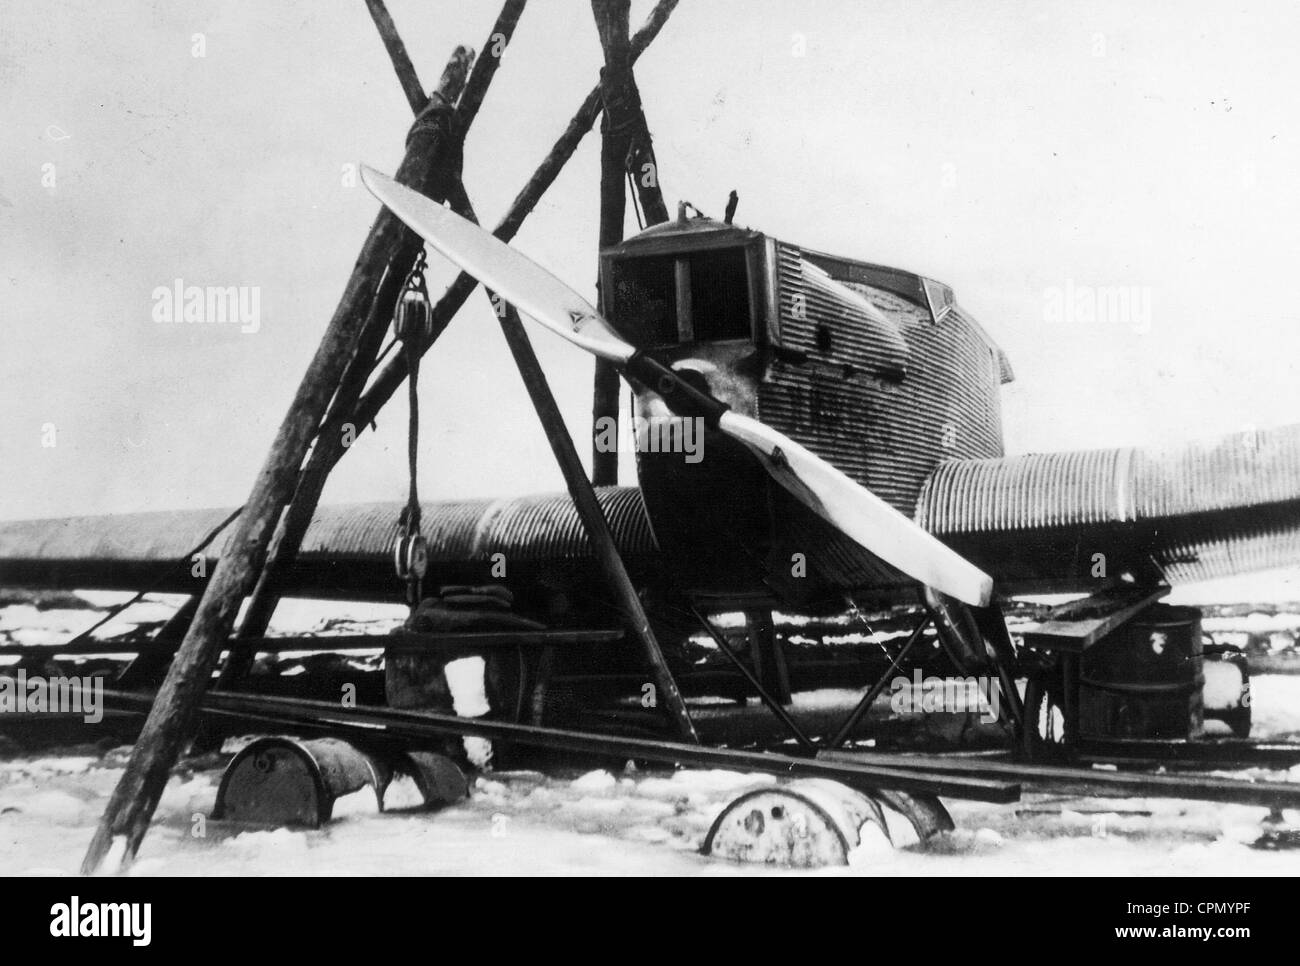 Die Junkers Motor Bremen nach seiner legendären Transatlantik-Flug, 1928 Stockbild